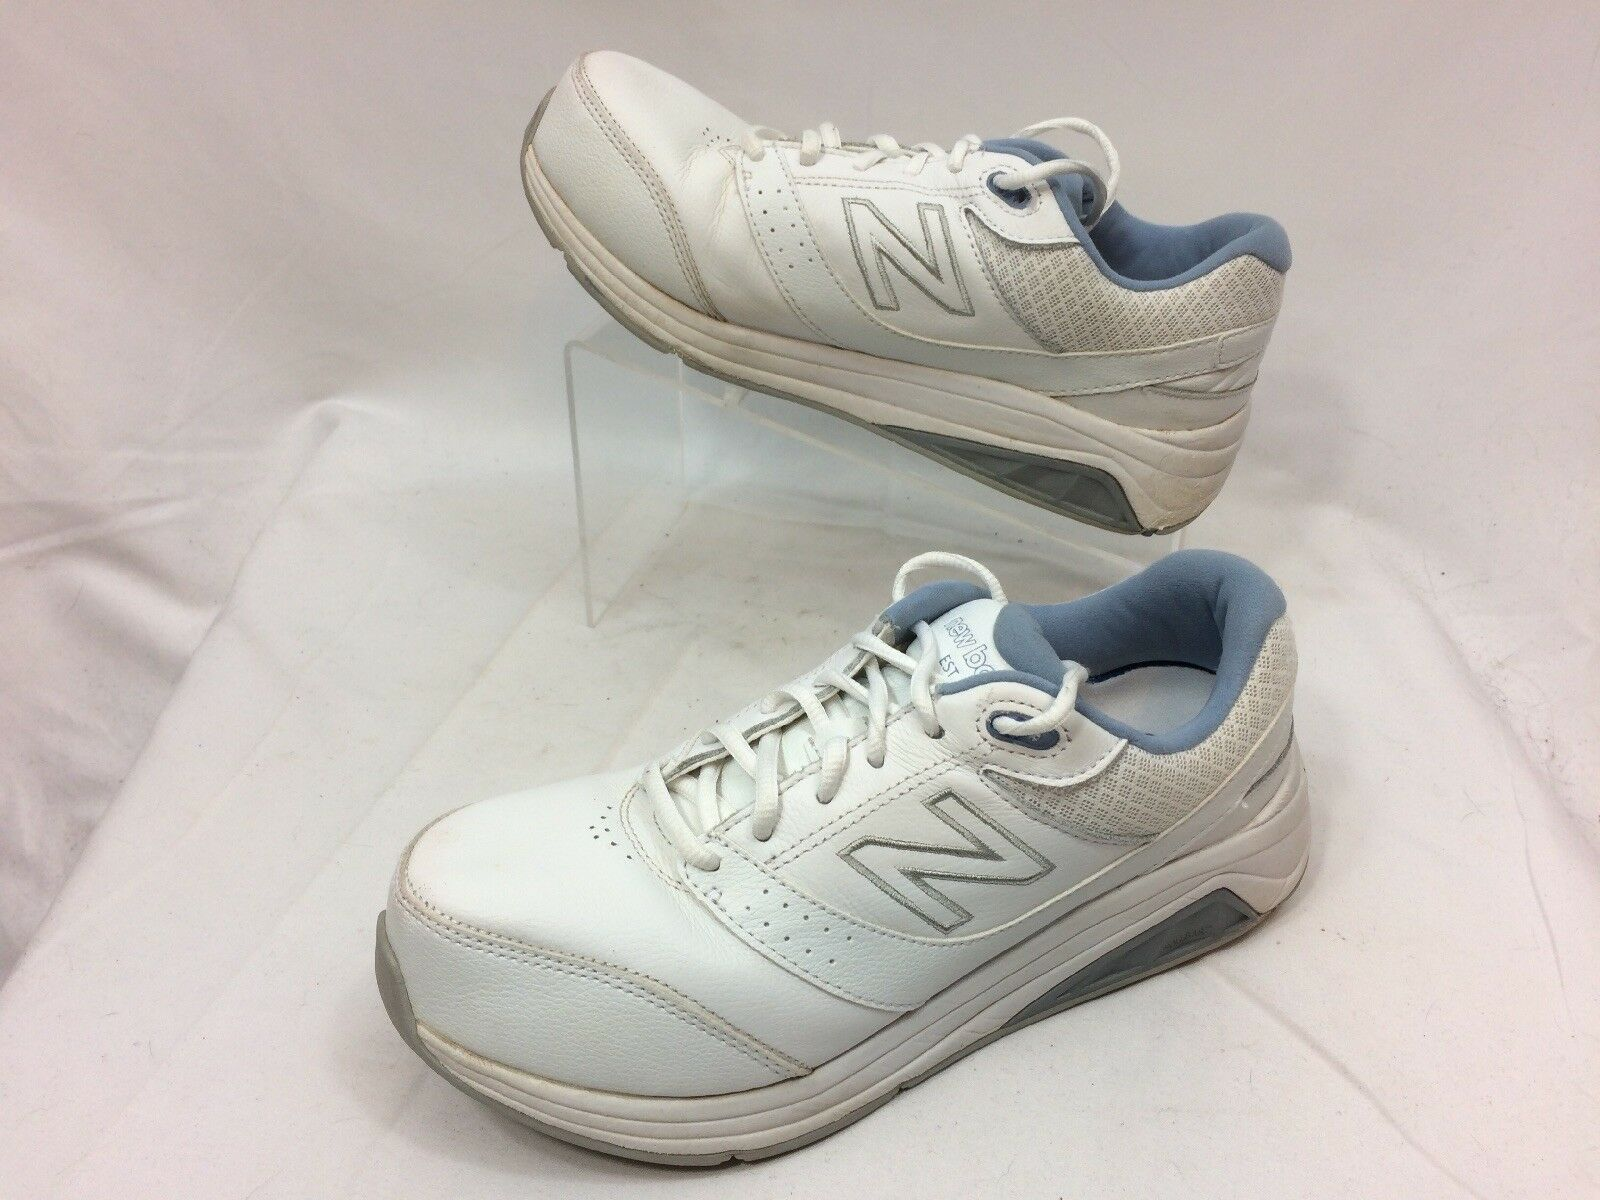 New Balance 928V2 Women's Walking shoes WW928WB2 White US 8.5 - EU 40